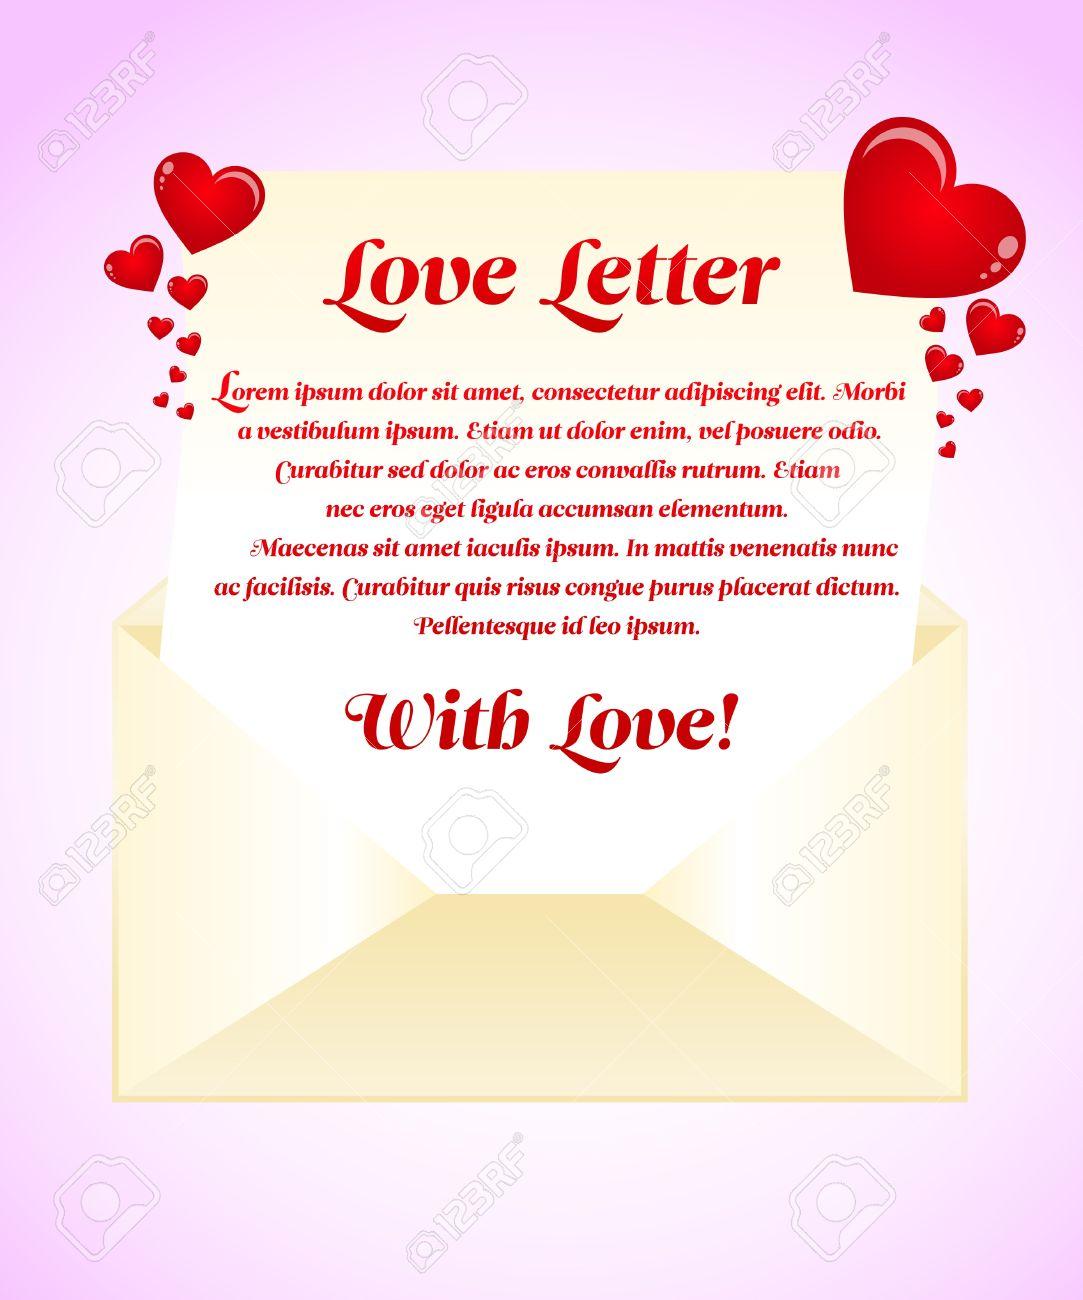 Doc585350 Love Letter Templates Free 65 Love Letter Templates – Love Letter Template Word